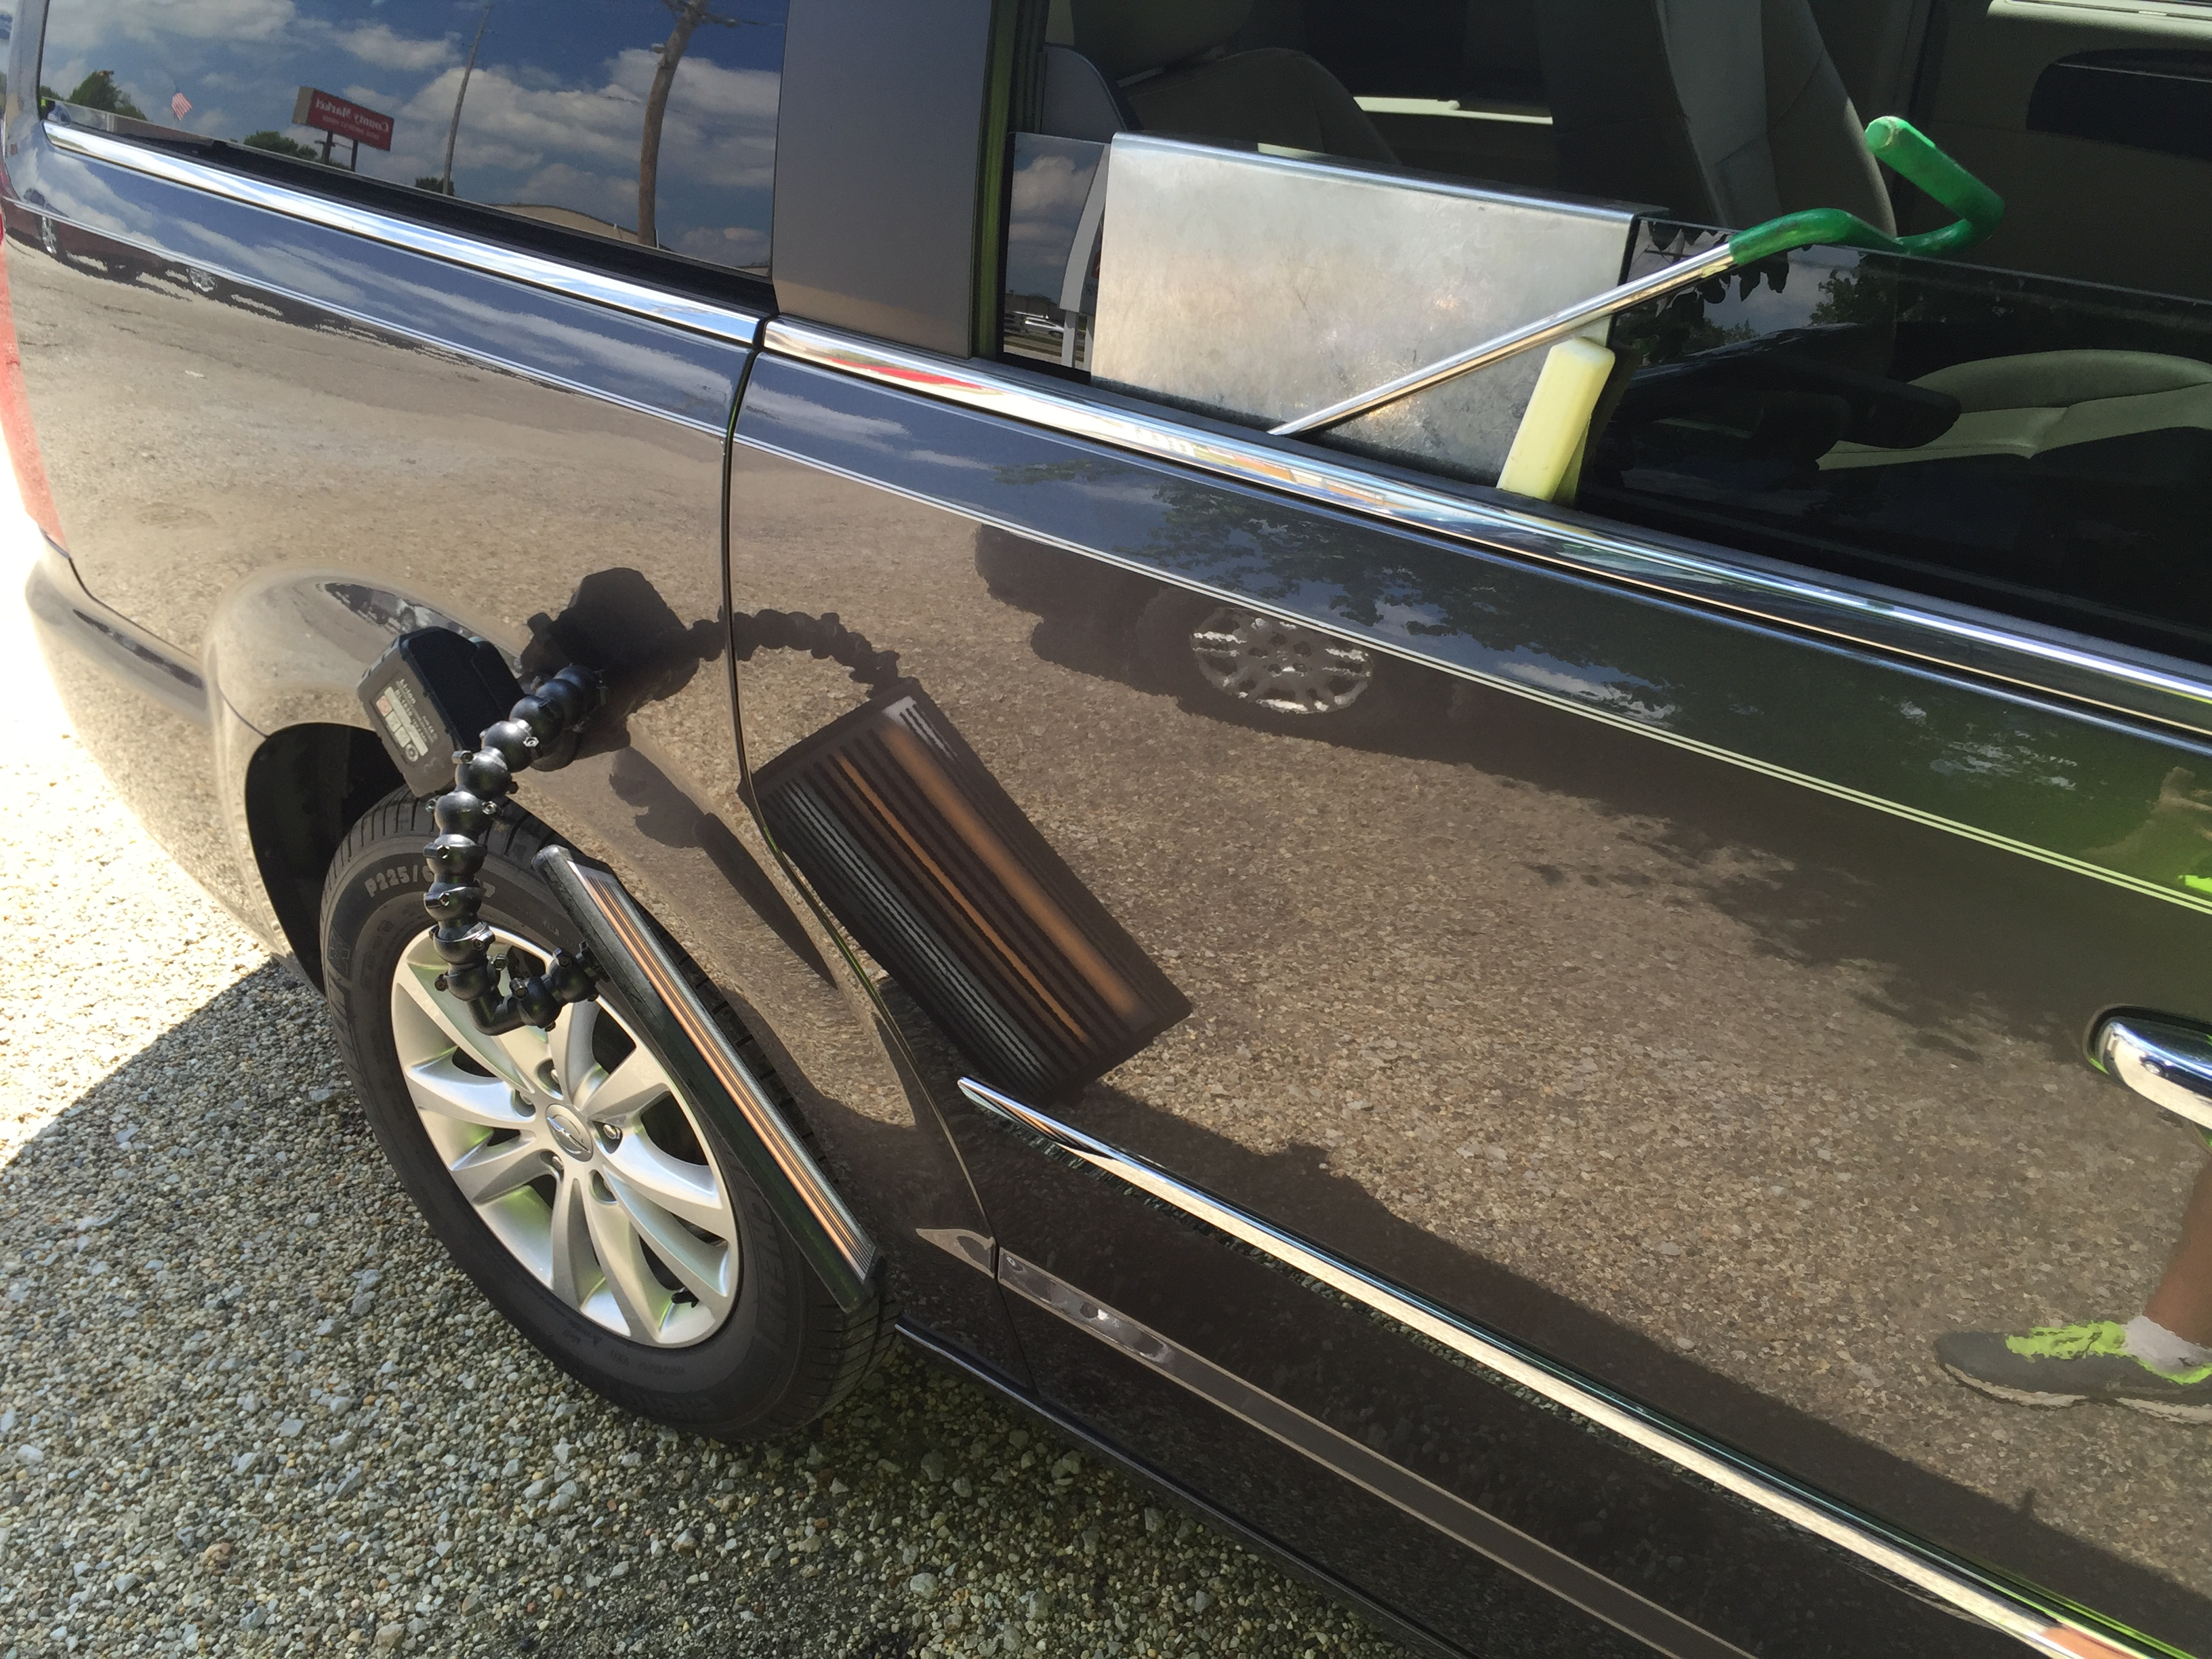 Springfield, IL Dent Repair, 2015 Chrysler Town & Country Sliding door, paintless dent Repair, http://217dent.com